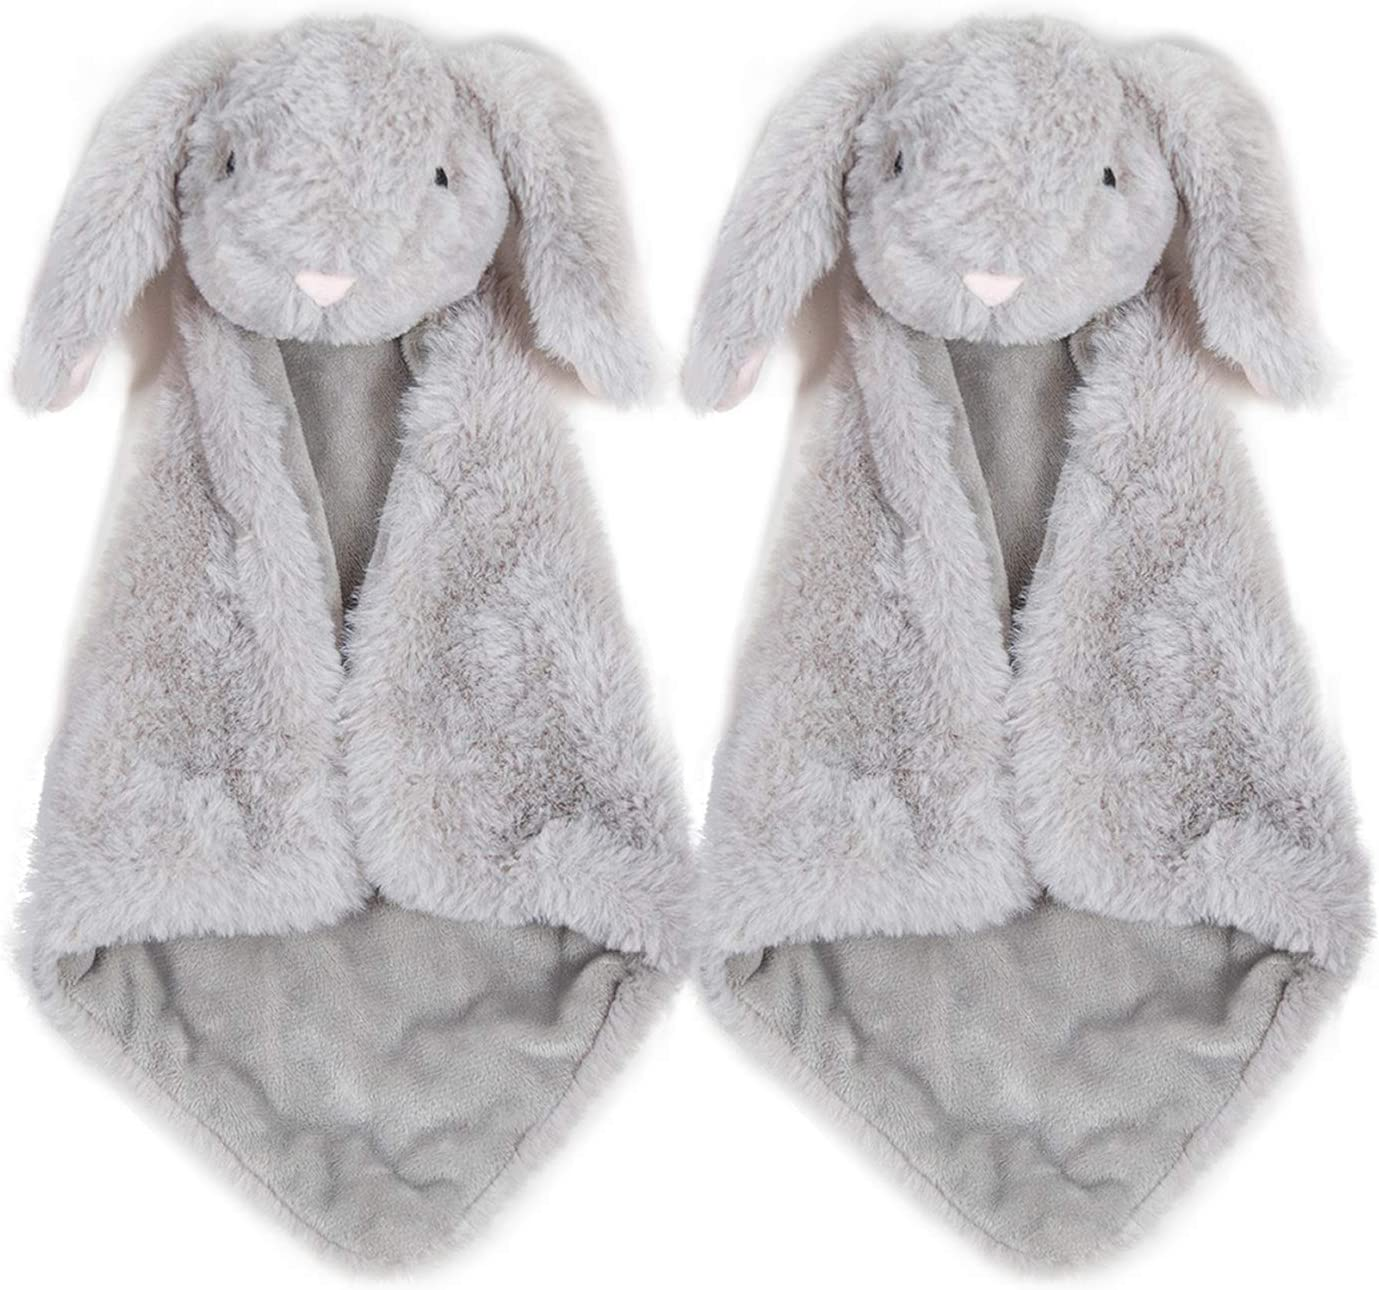 Security Blanket Penguin woobie luvi Lovems lovie